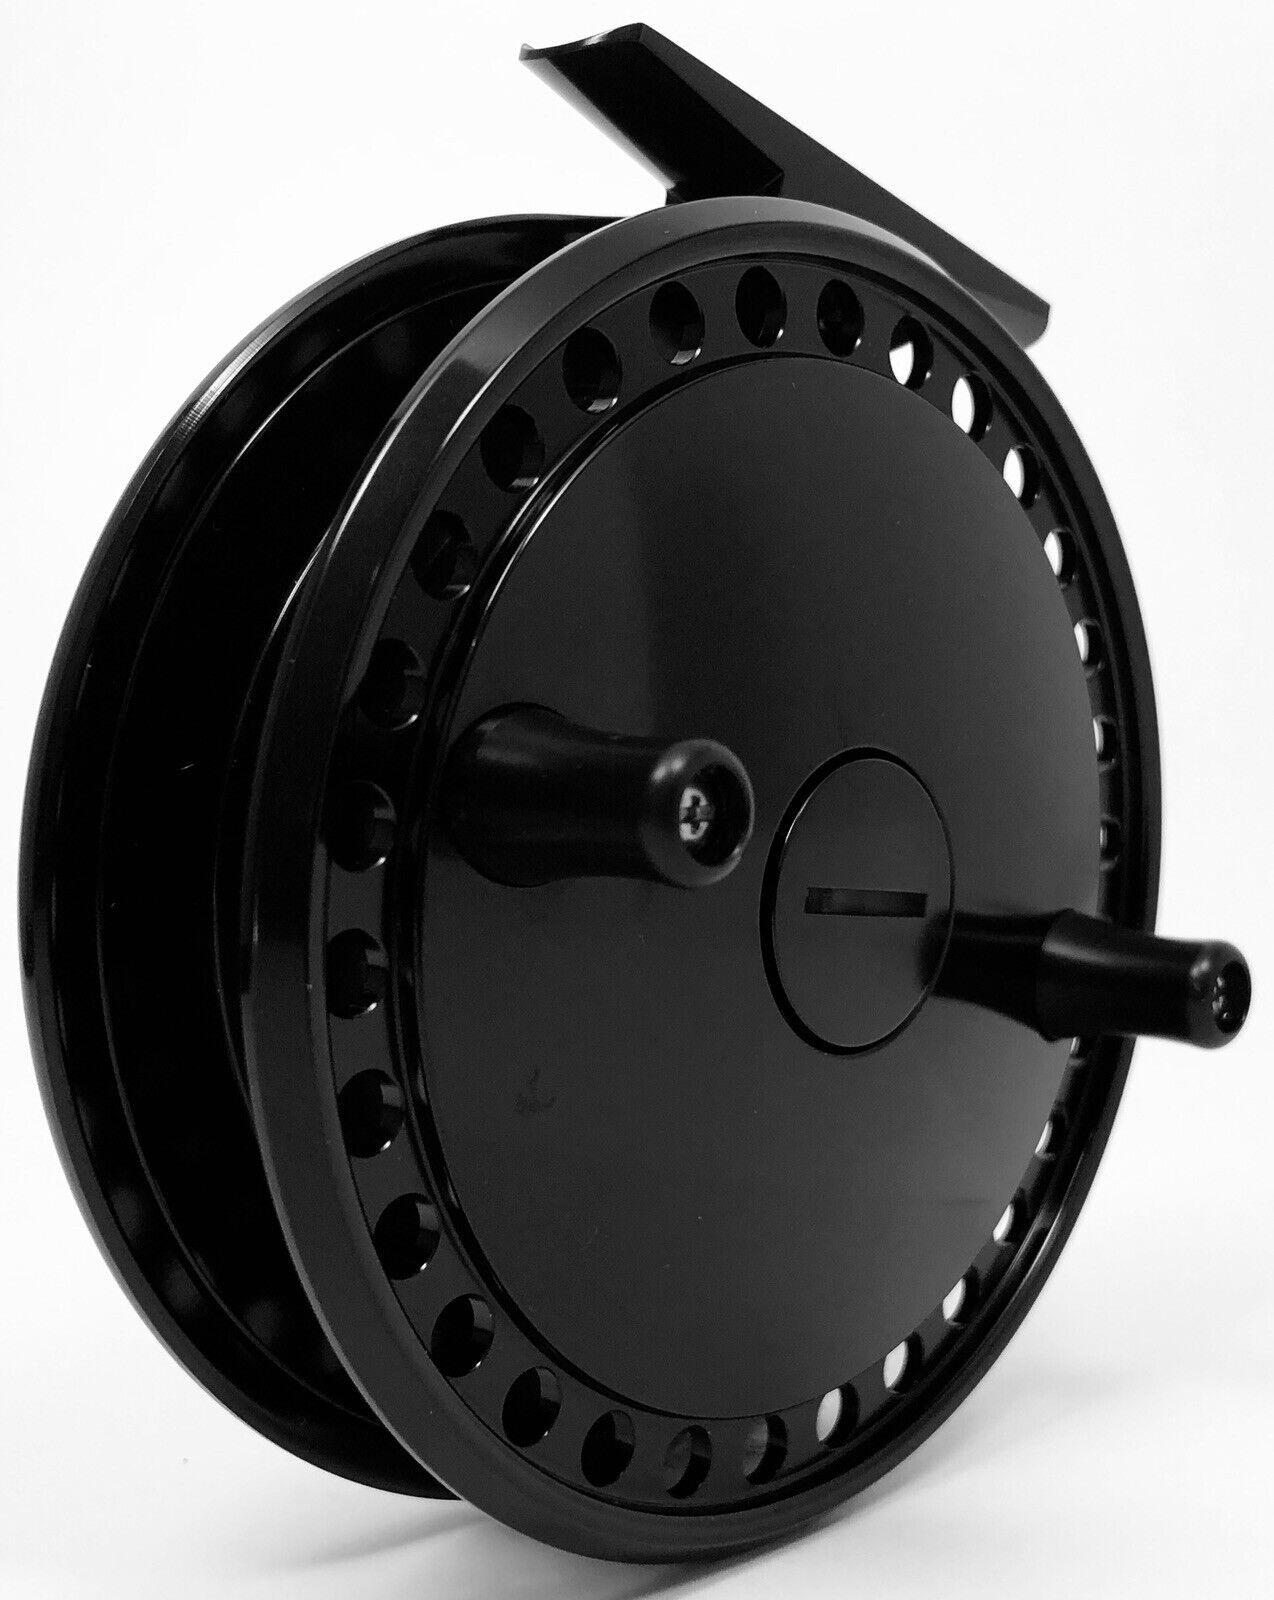 Raven Matrix 4 3 8  Centerpin Cocherete De Flotador (Negro), Bolsa De Cocherete Libre Raven  Nuevo